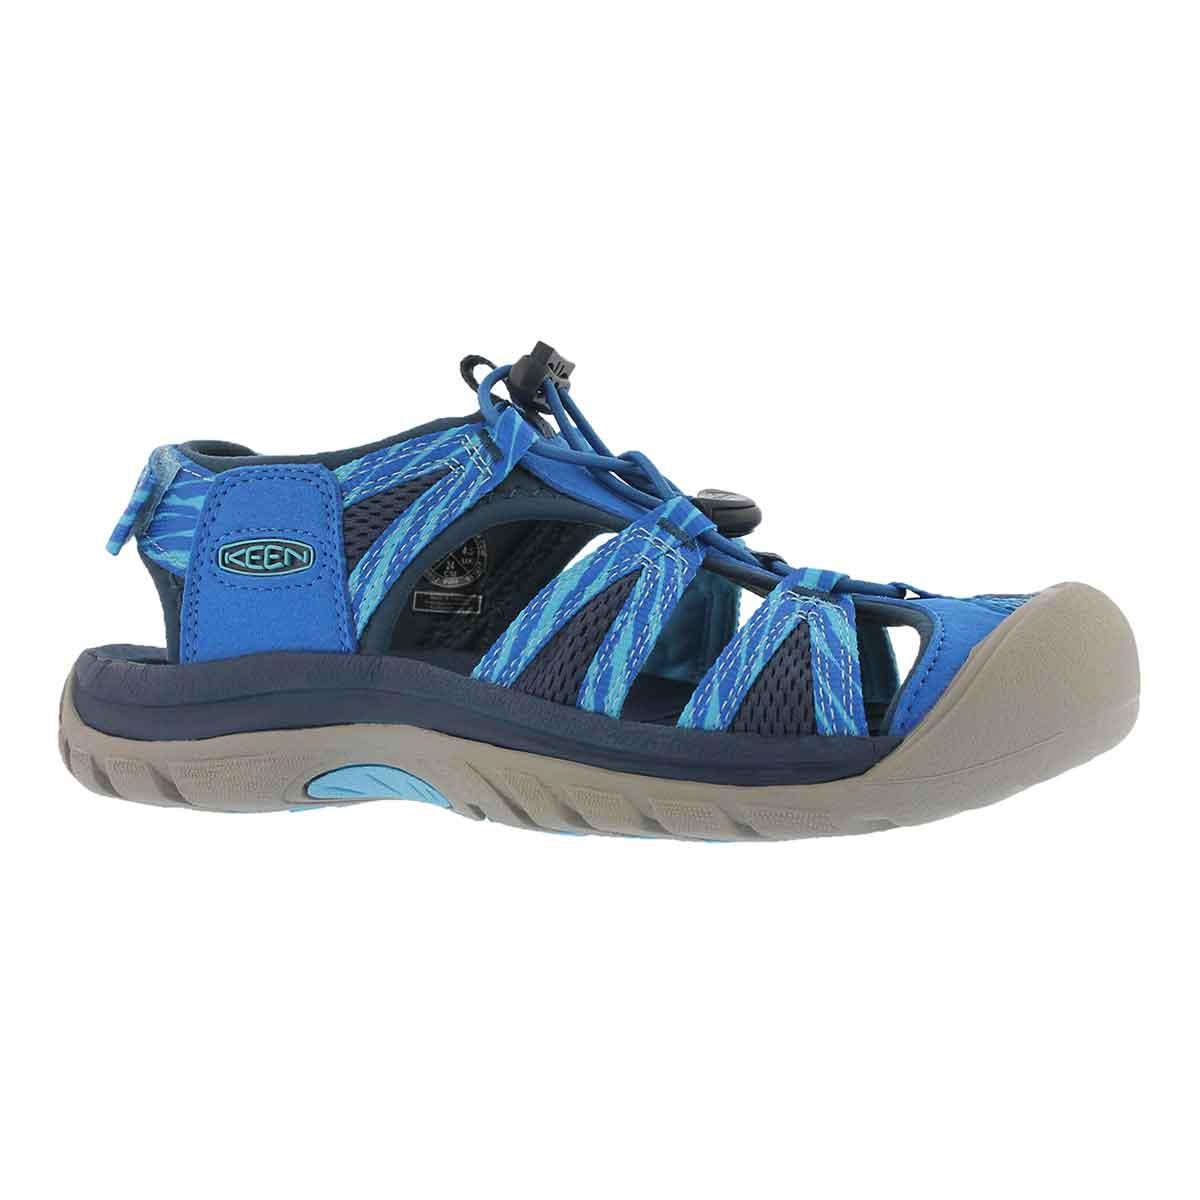 Women's VENICE II H2 blue opal sport sandals